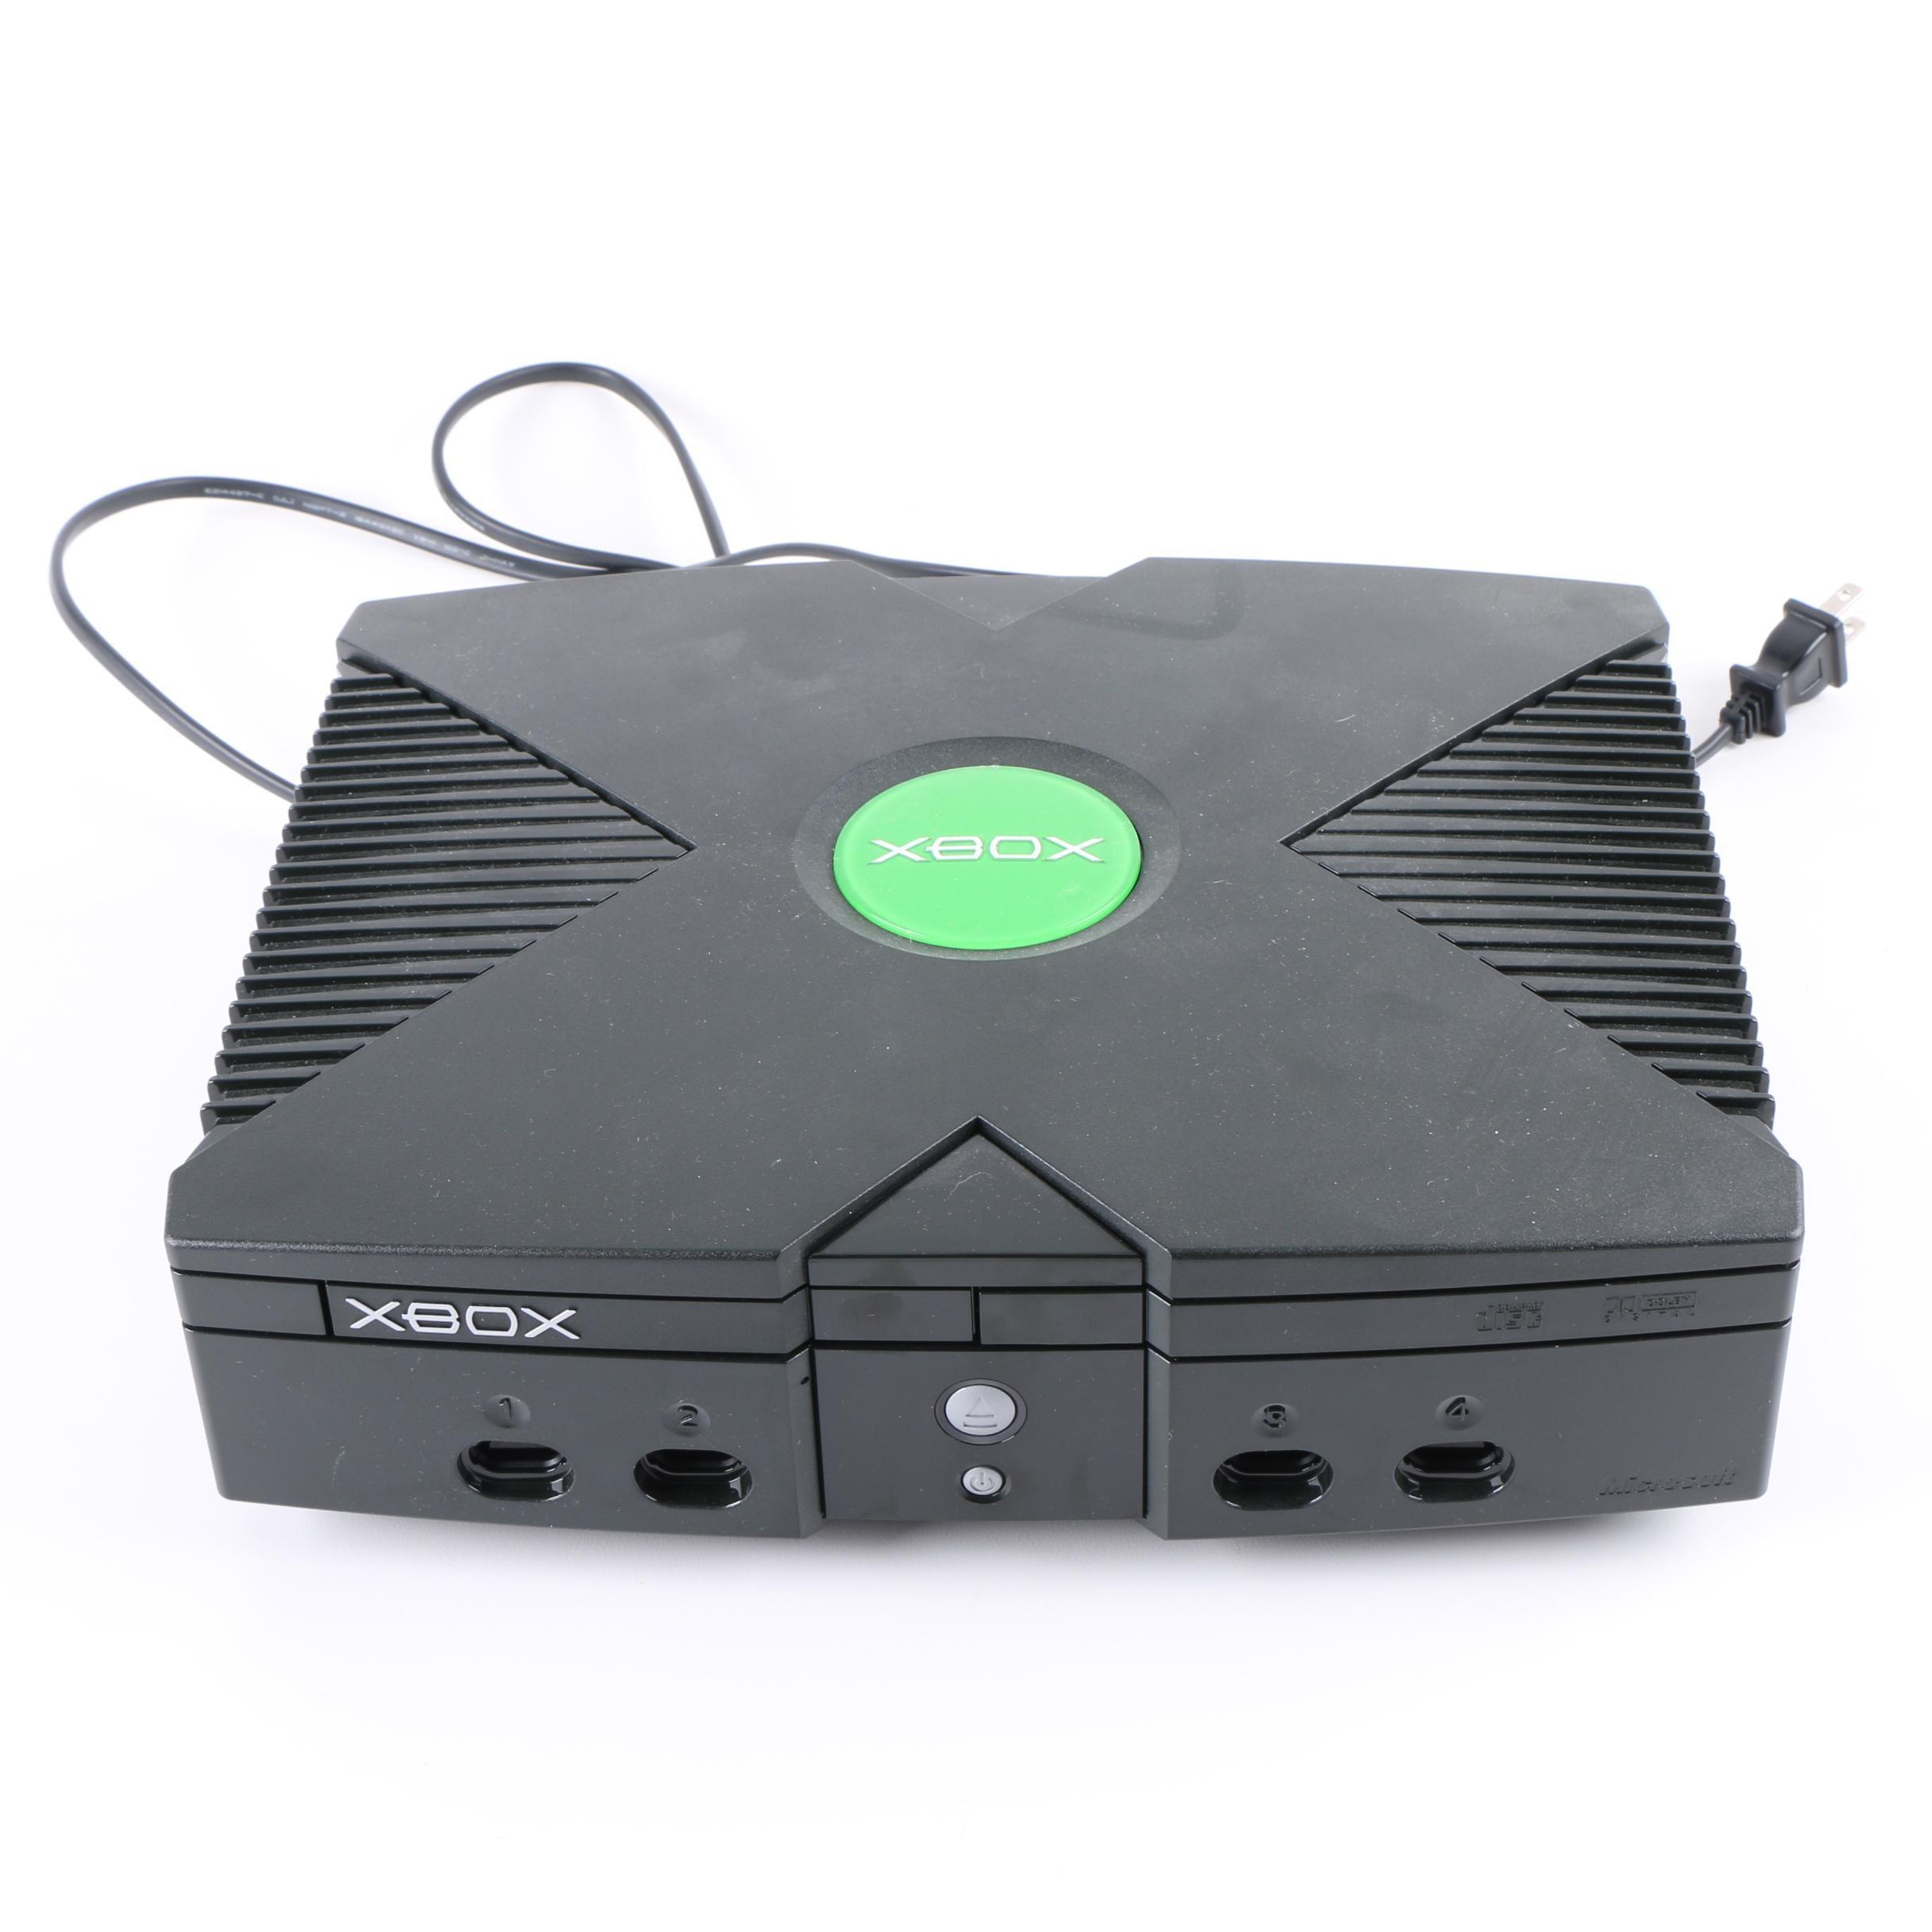 Microsoft Original Xbox Video Game Console